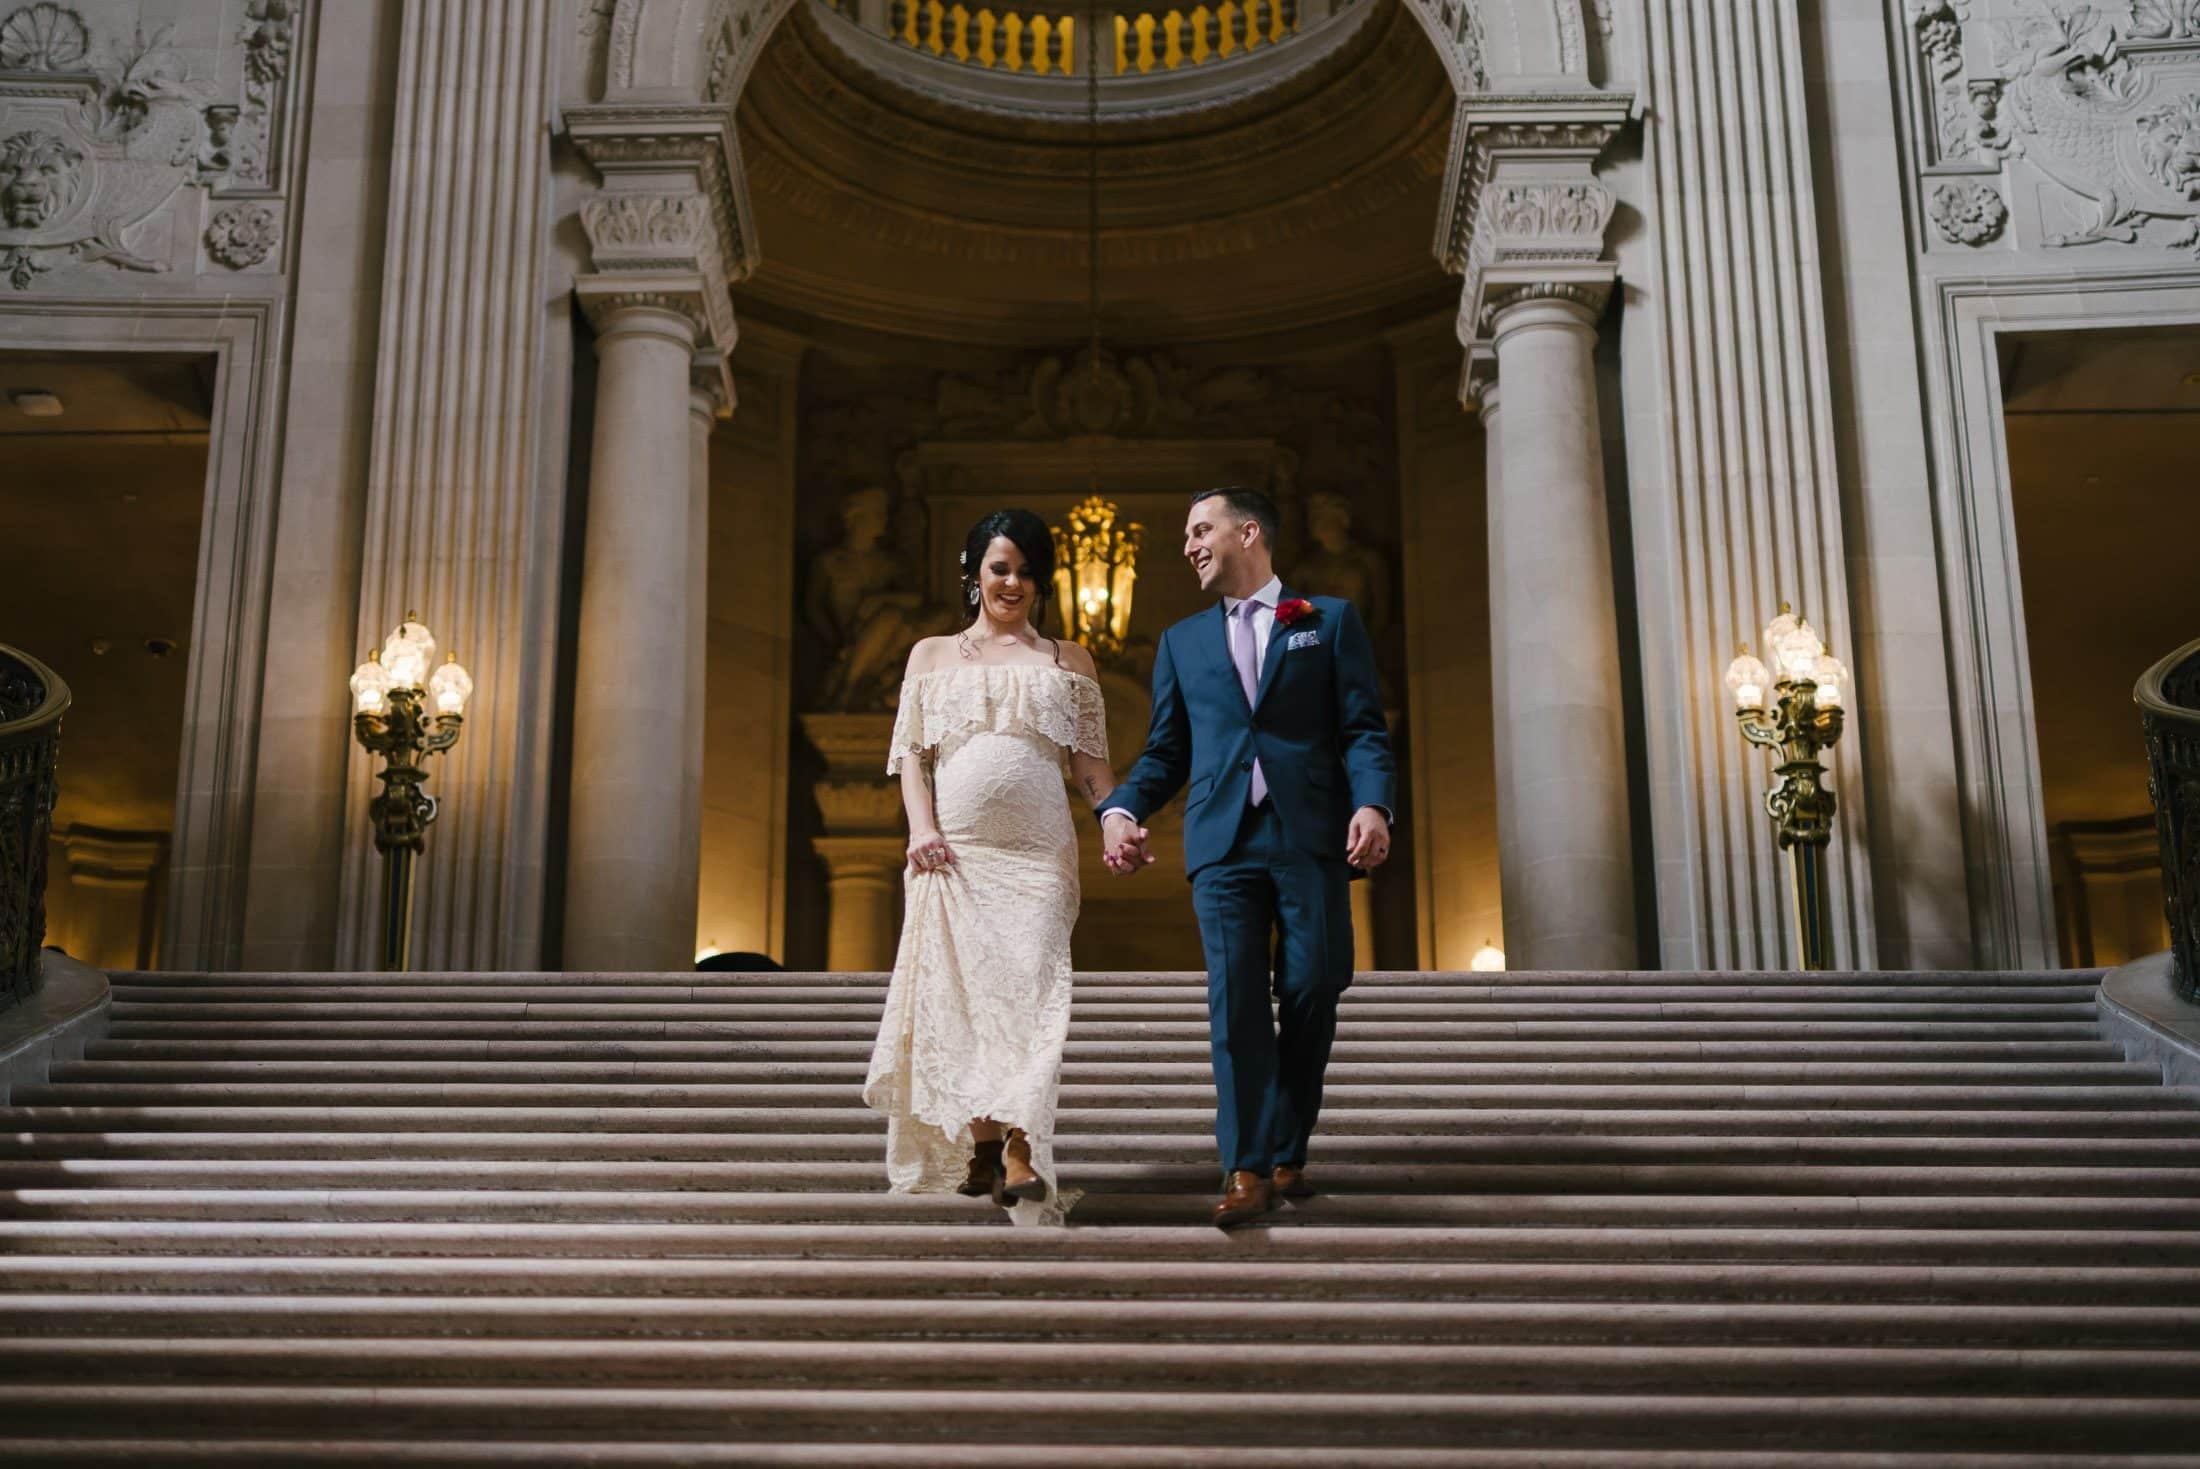 San Francisco City Hall Wedding Stairs